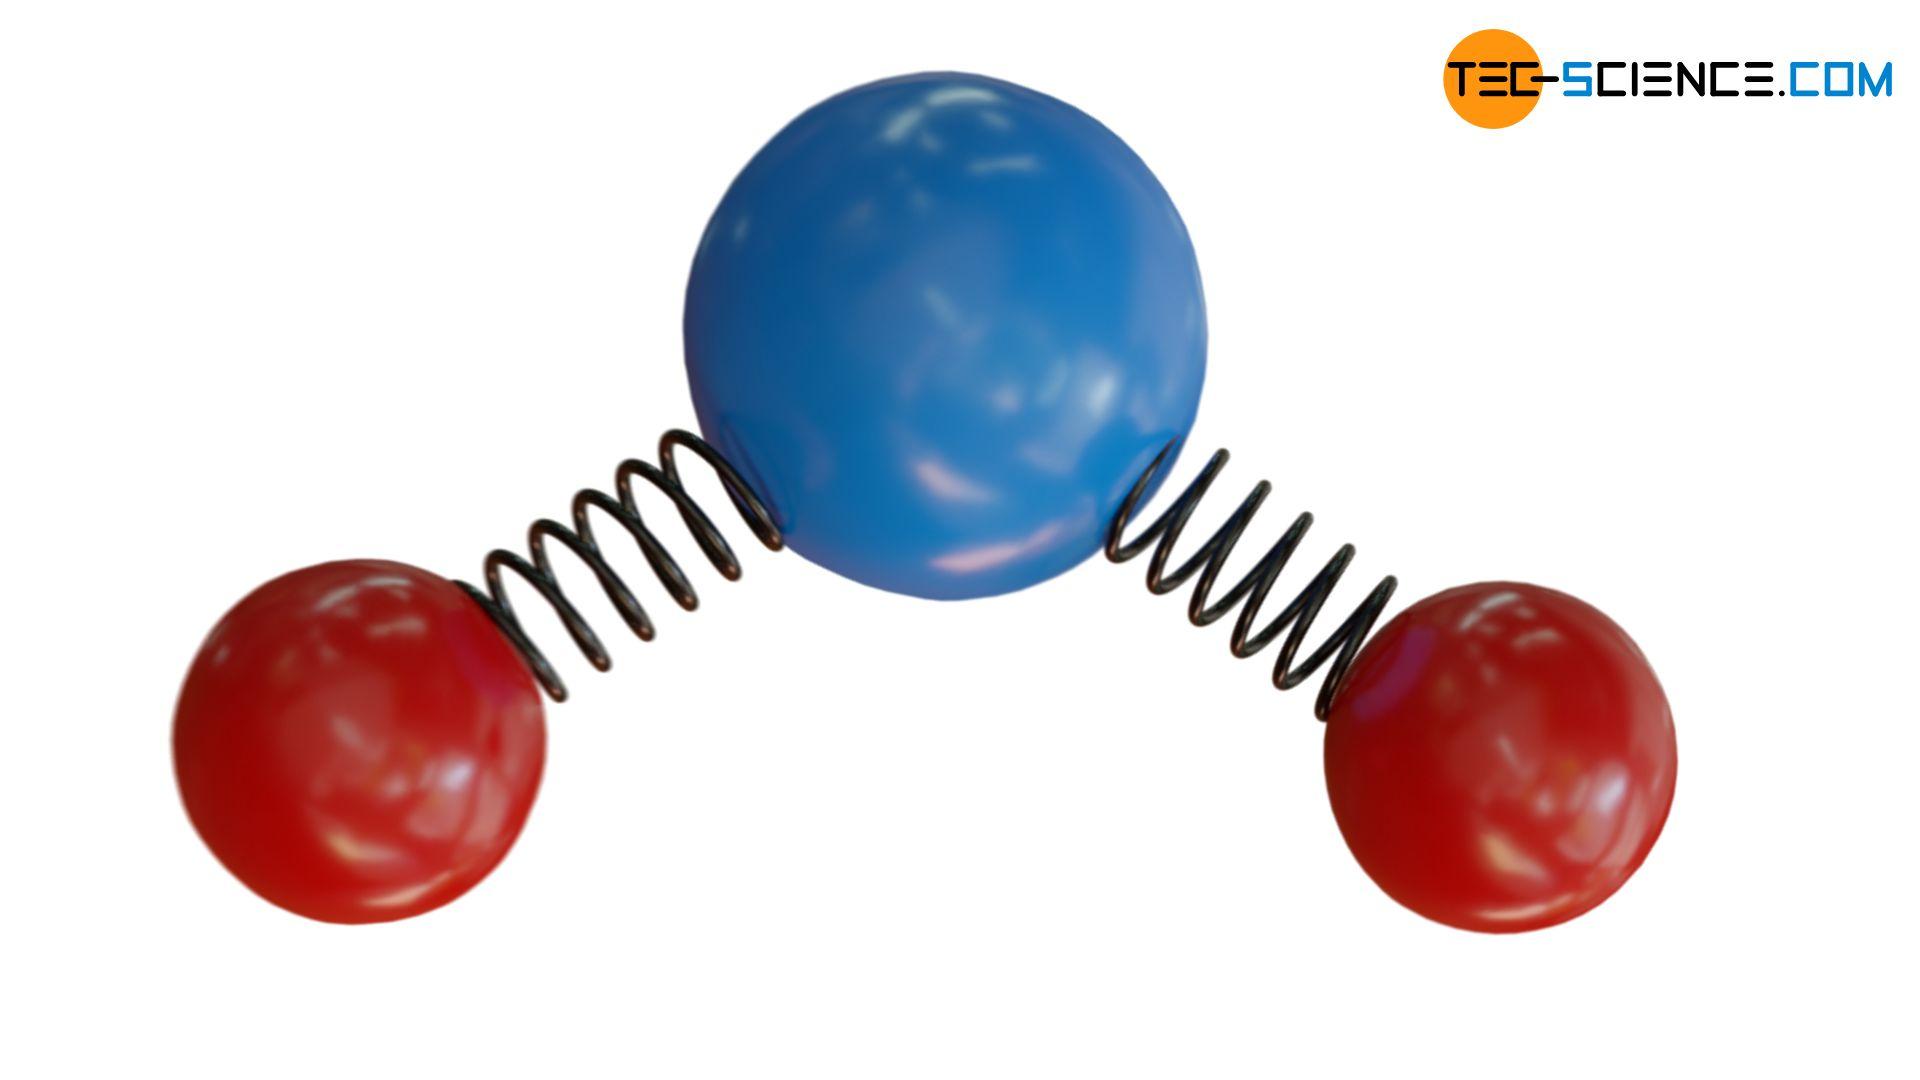 Schematic illustration of a molecule